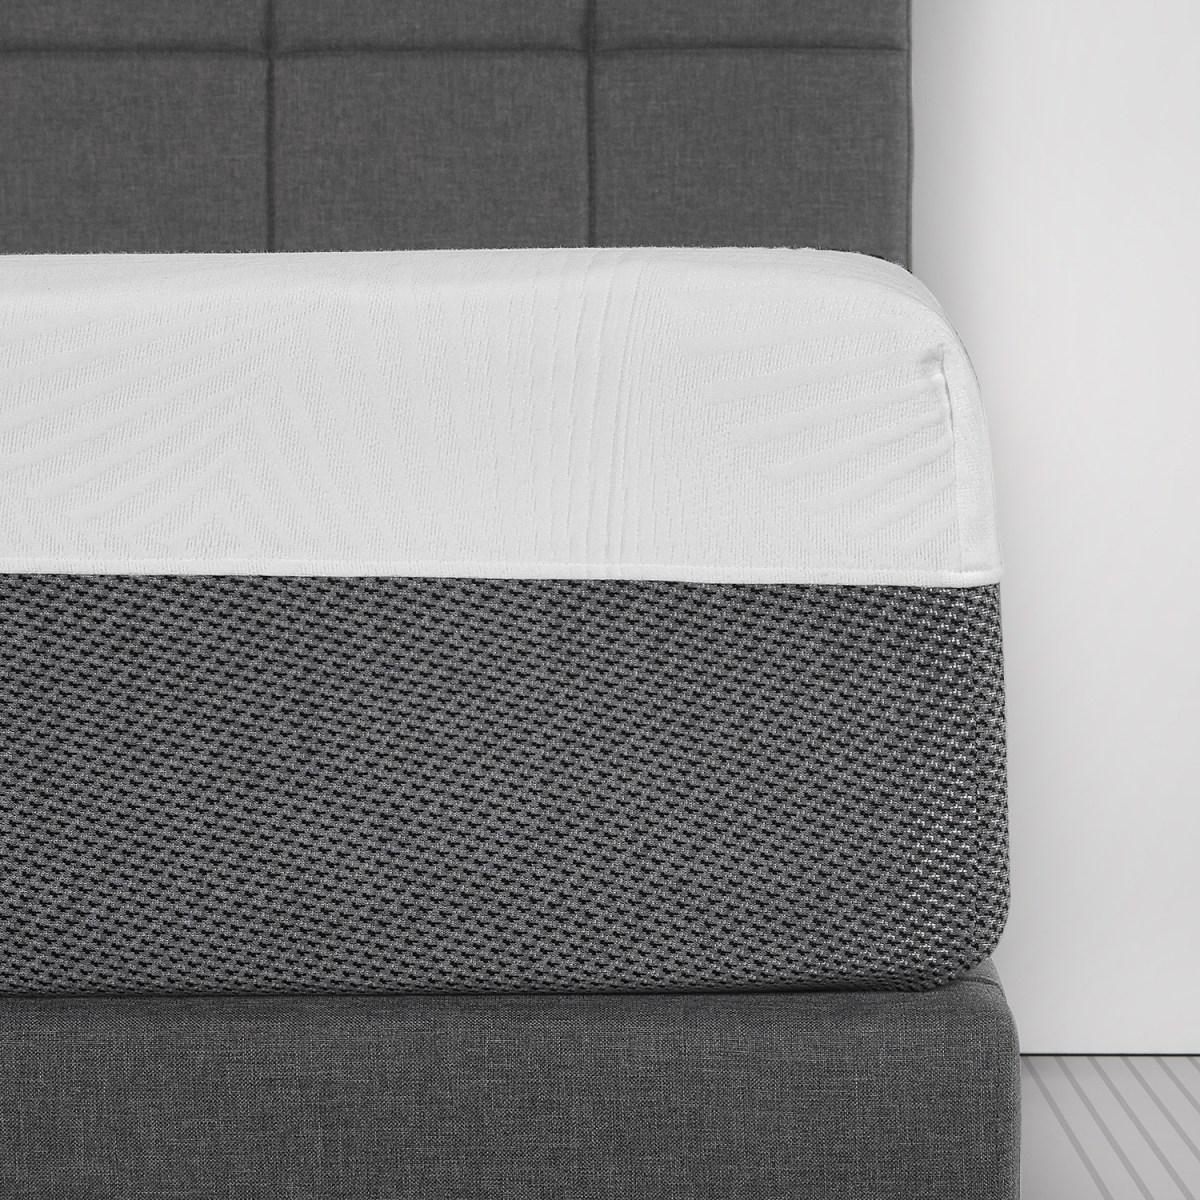 "Spa Sensation 12"" mattress shown close up"